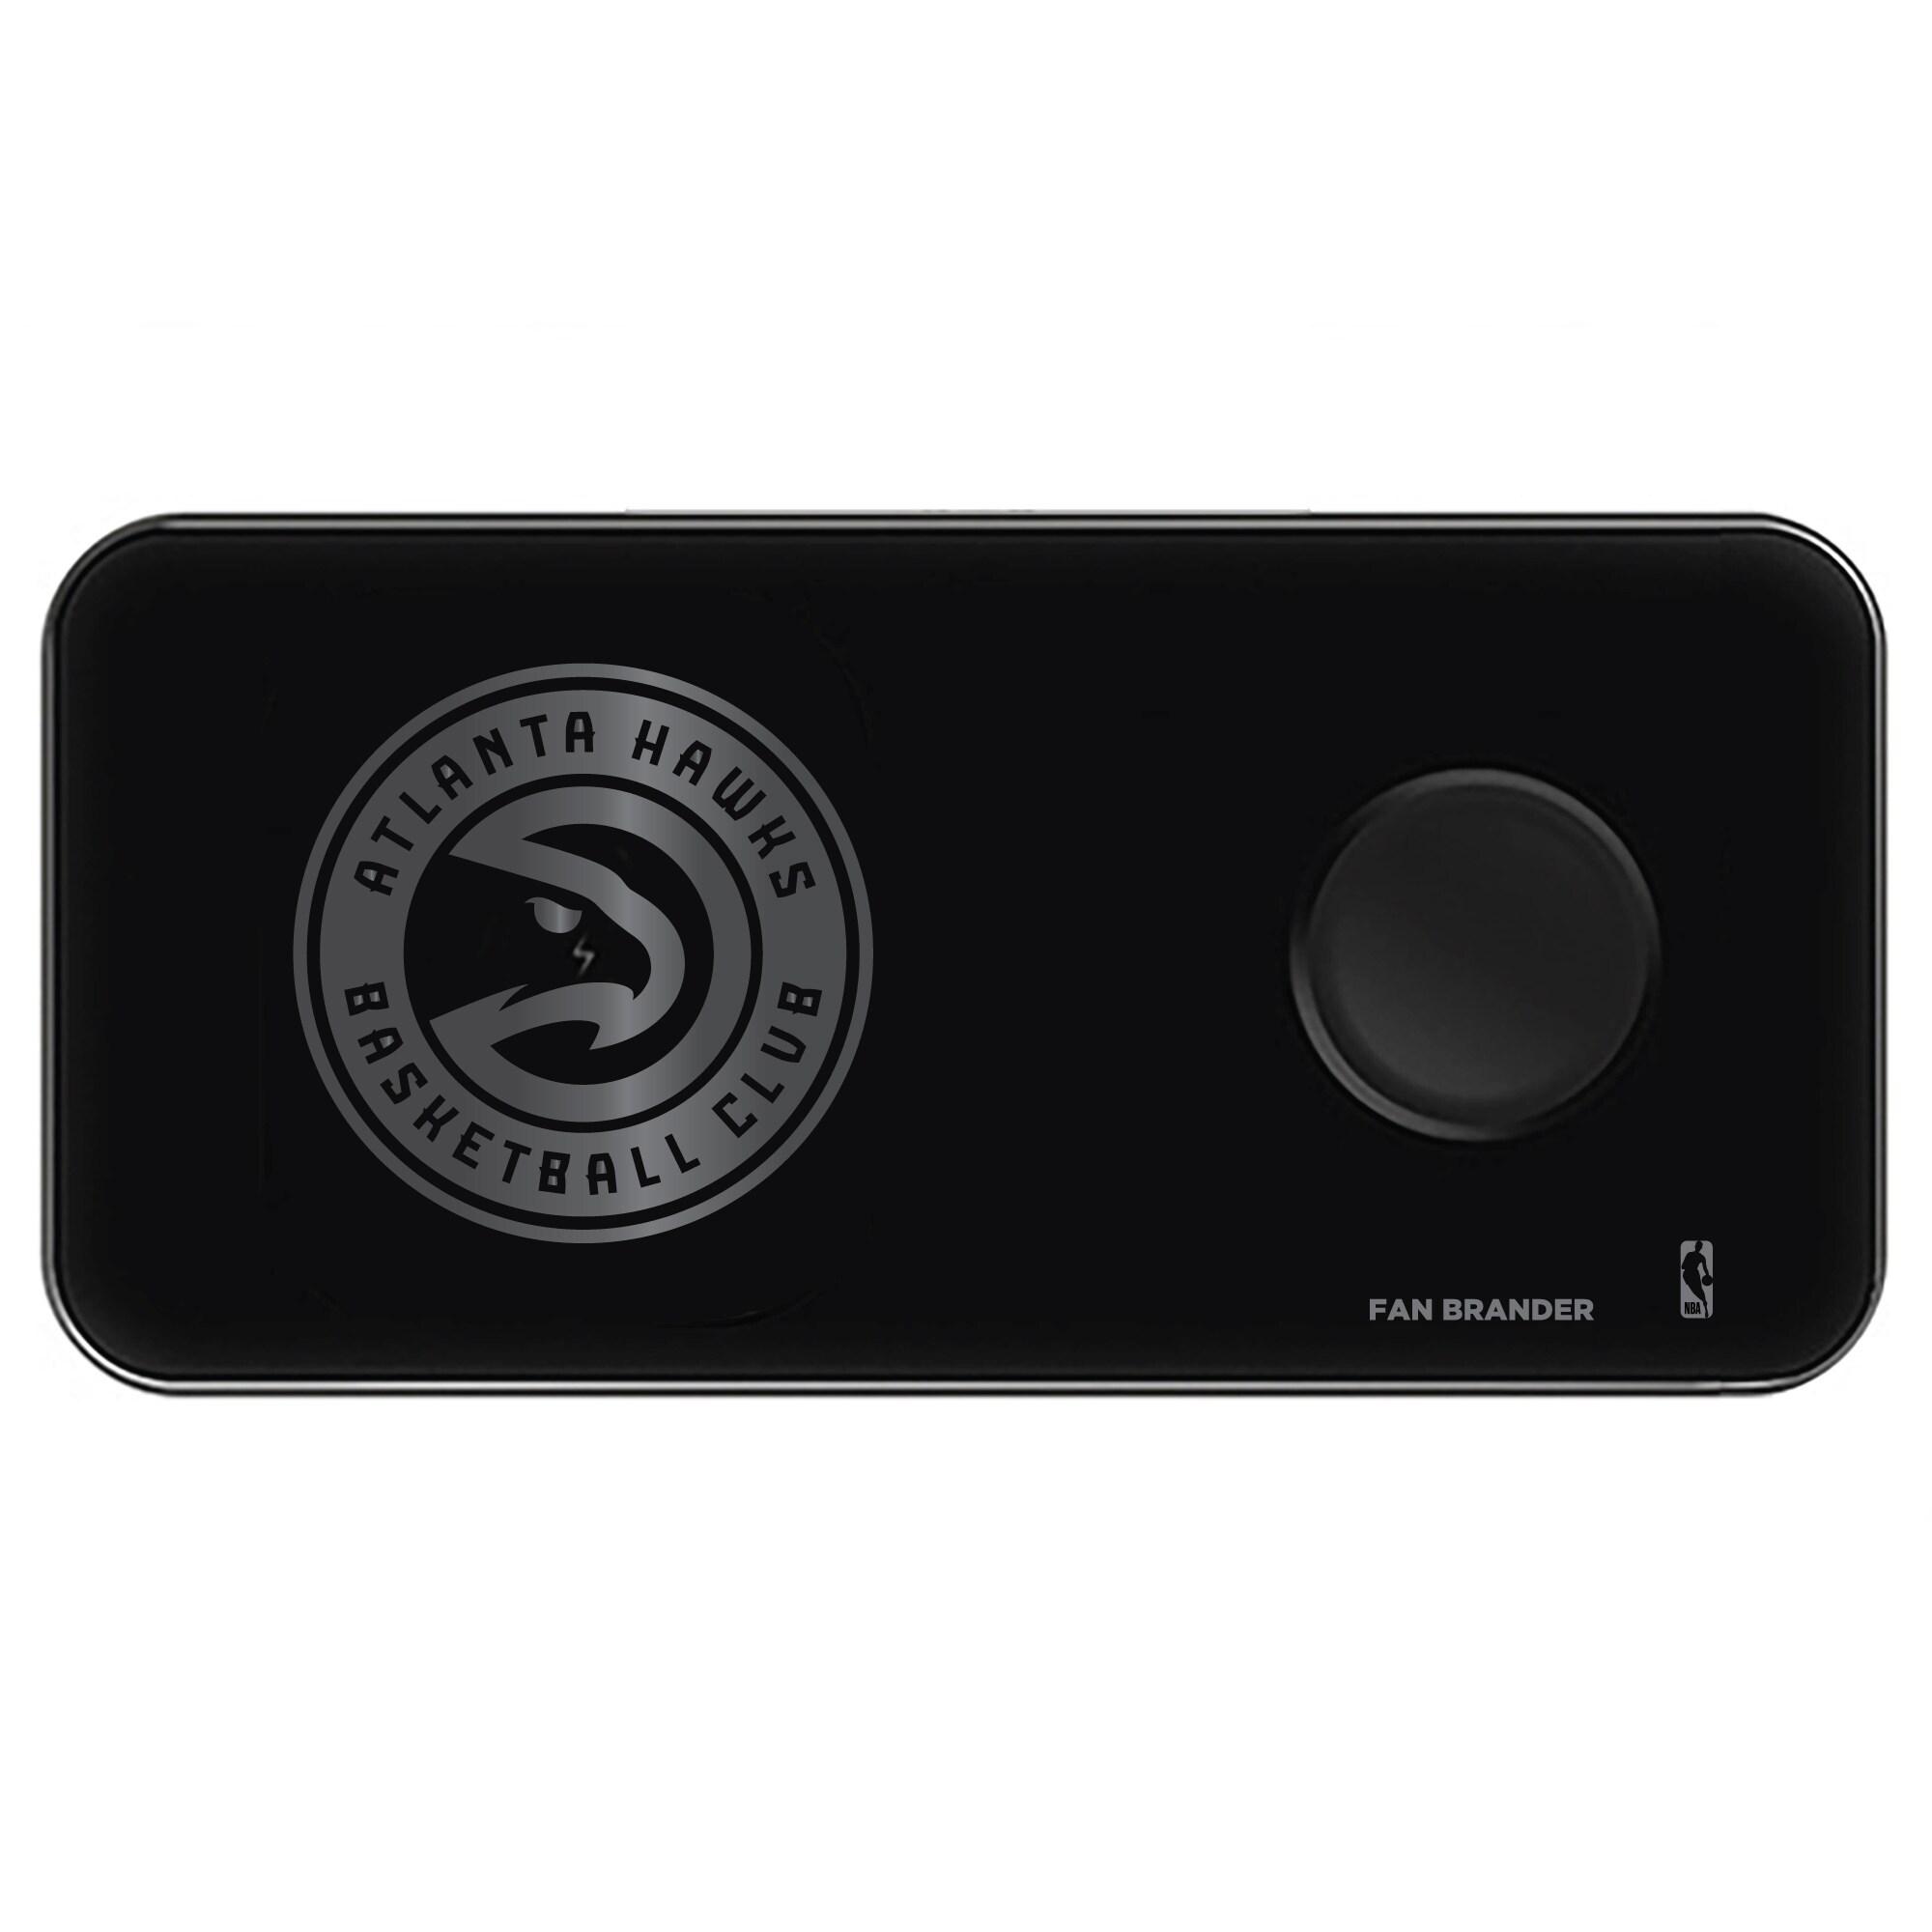 Atlanta Hawks 3-in-1 Glass Wireless Charge Pad - Black